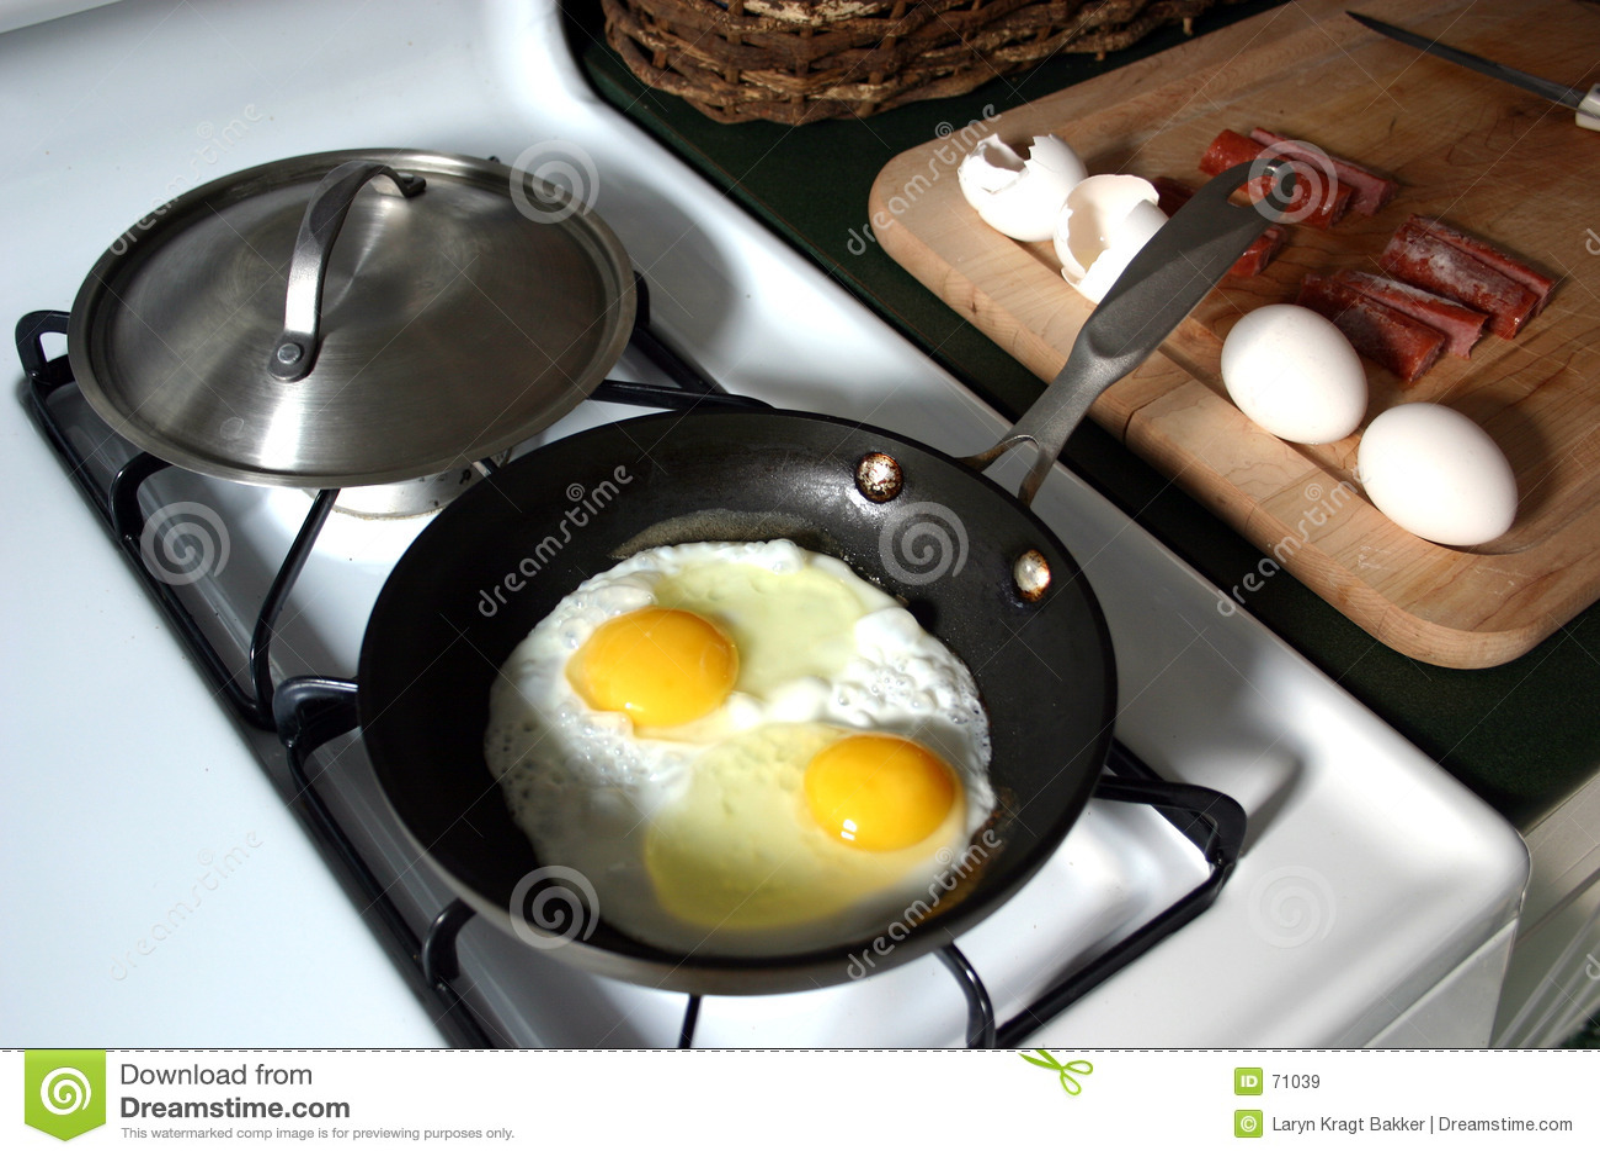 Breakfast - eggs&sausage